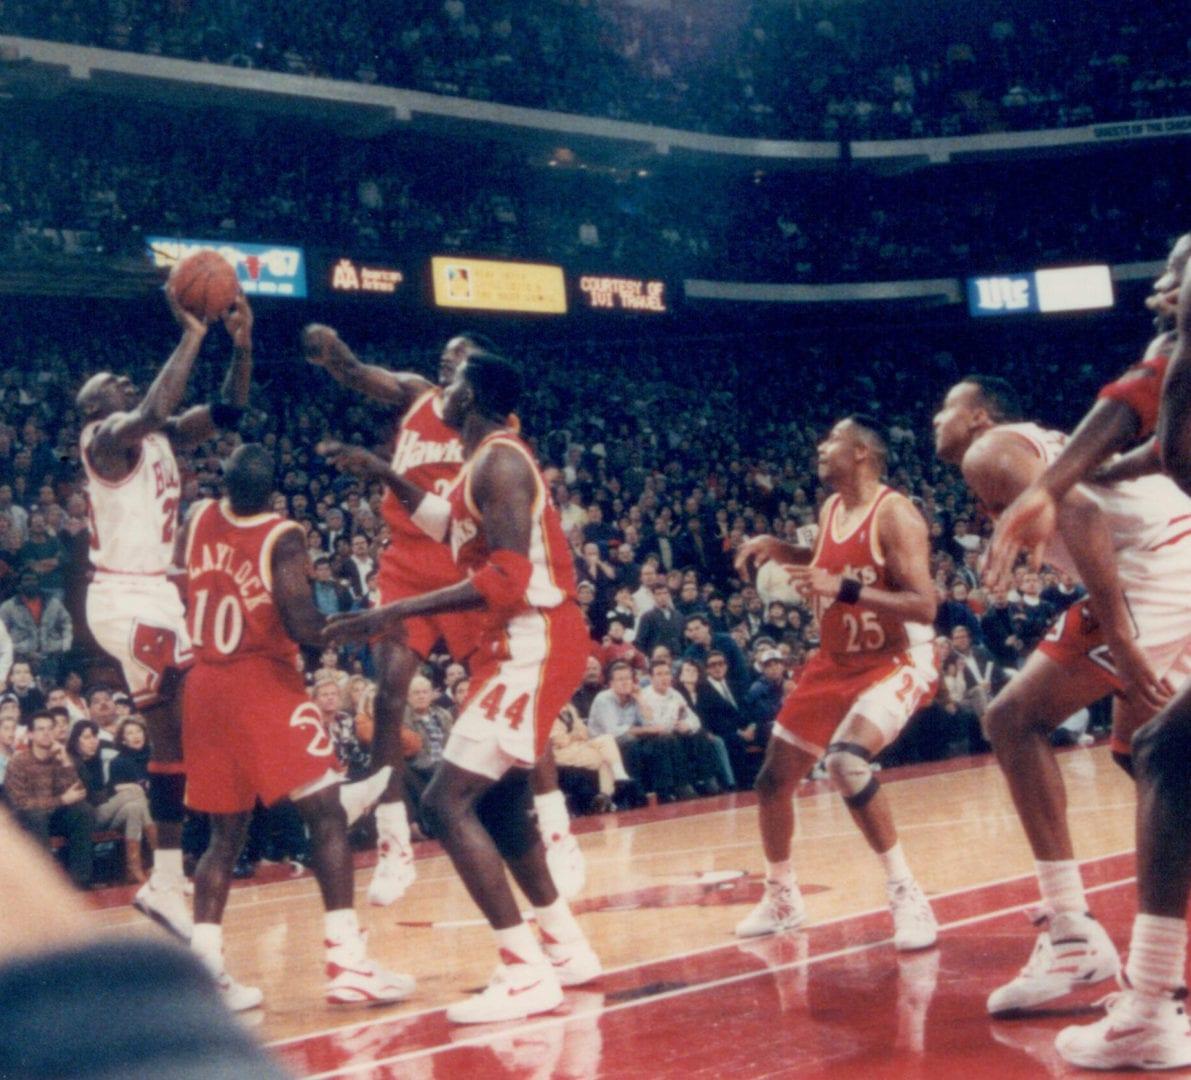 A jumpshot attempt of a basketball player